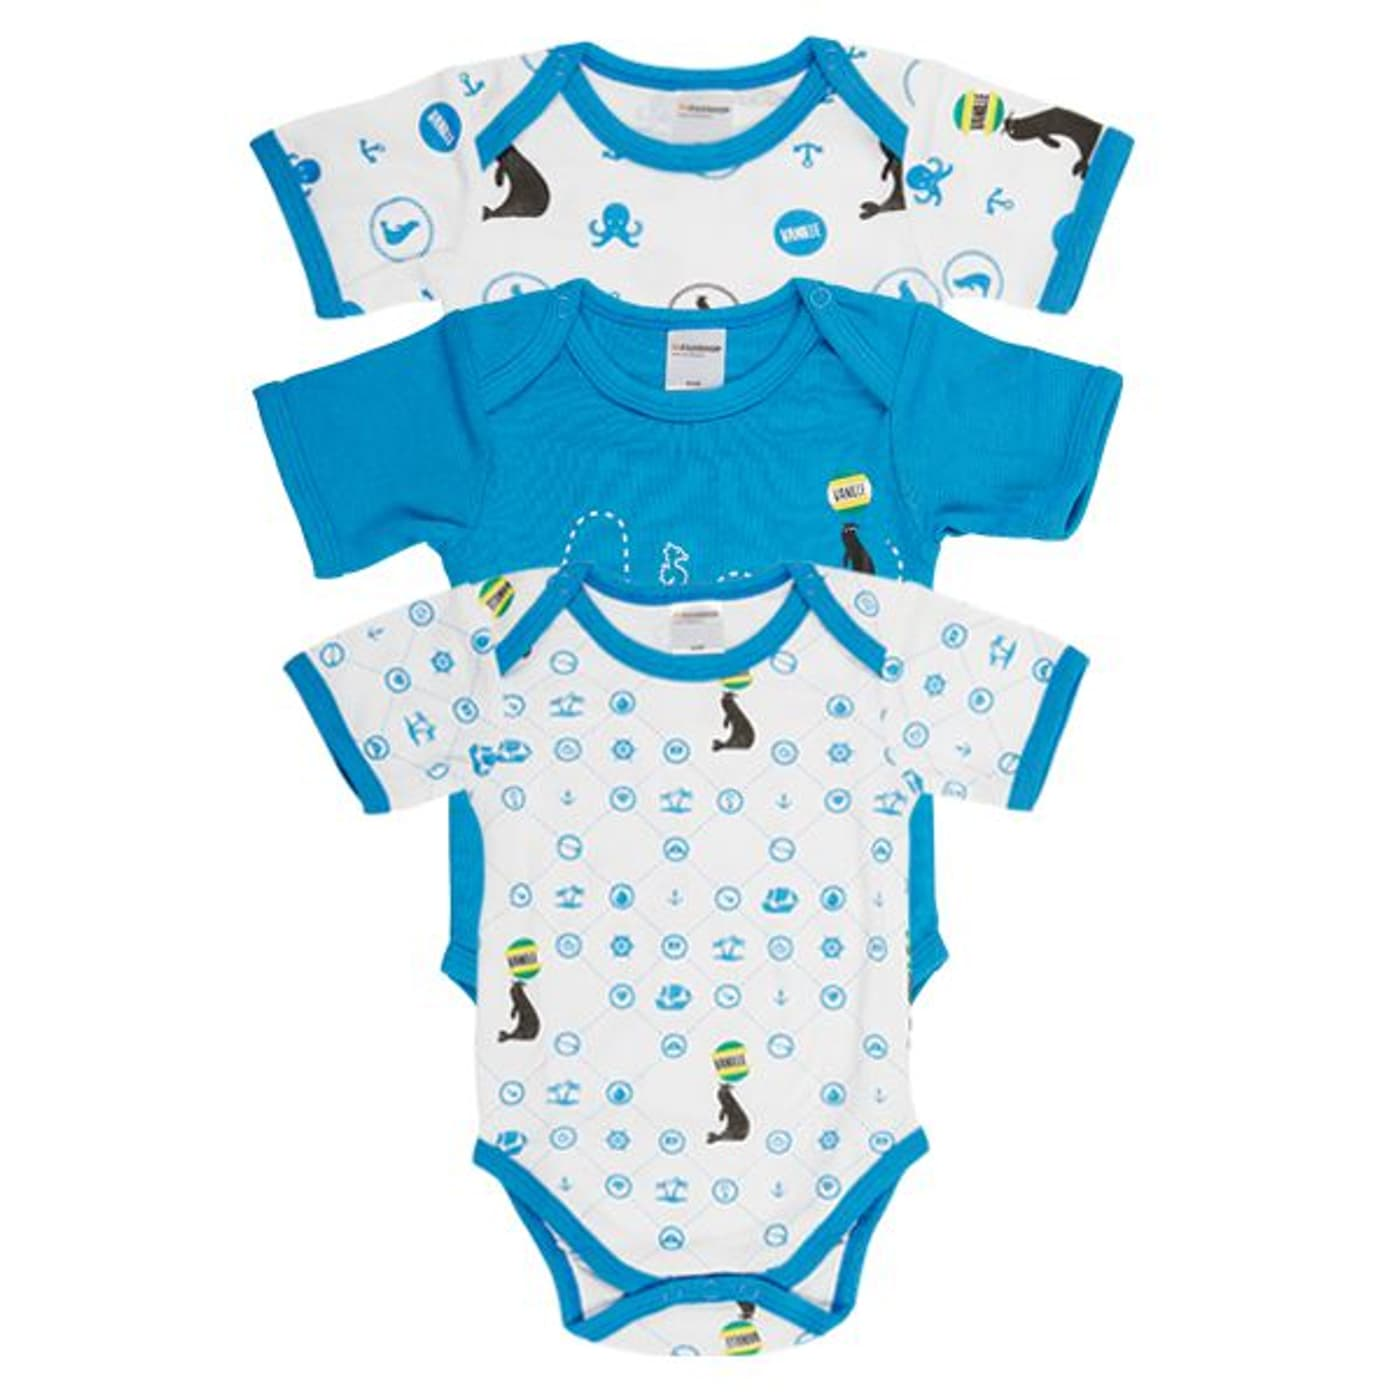 vanilleglace baby bodys 3er set kurz migros. Black Bedroom Furniture Sets. Home Design Ideas